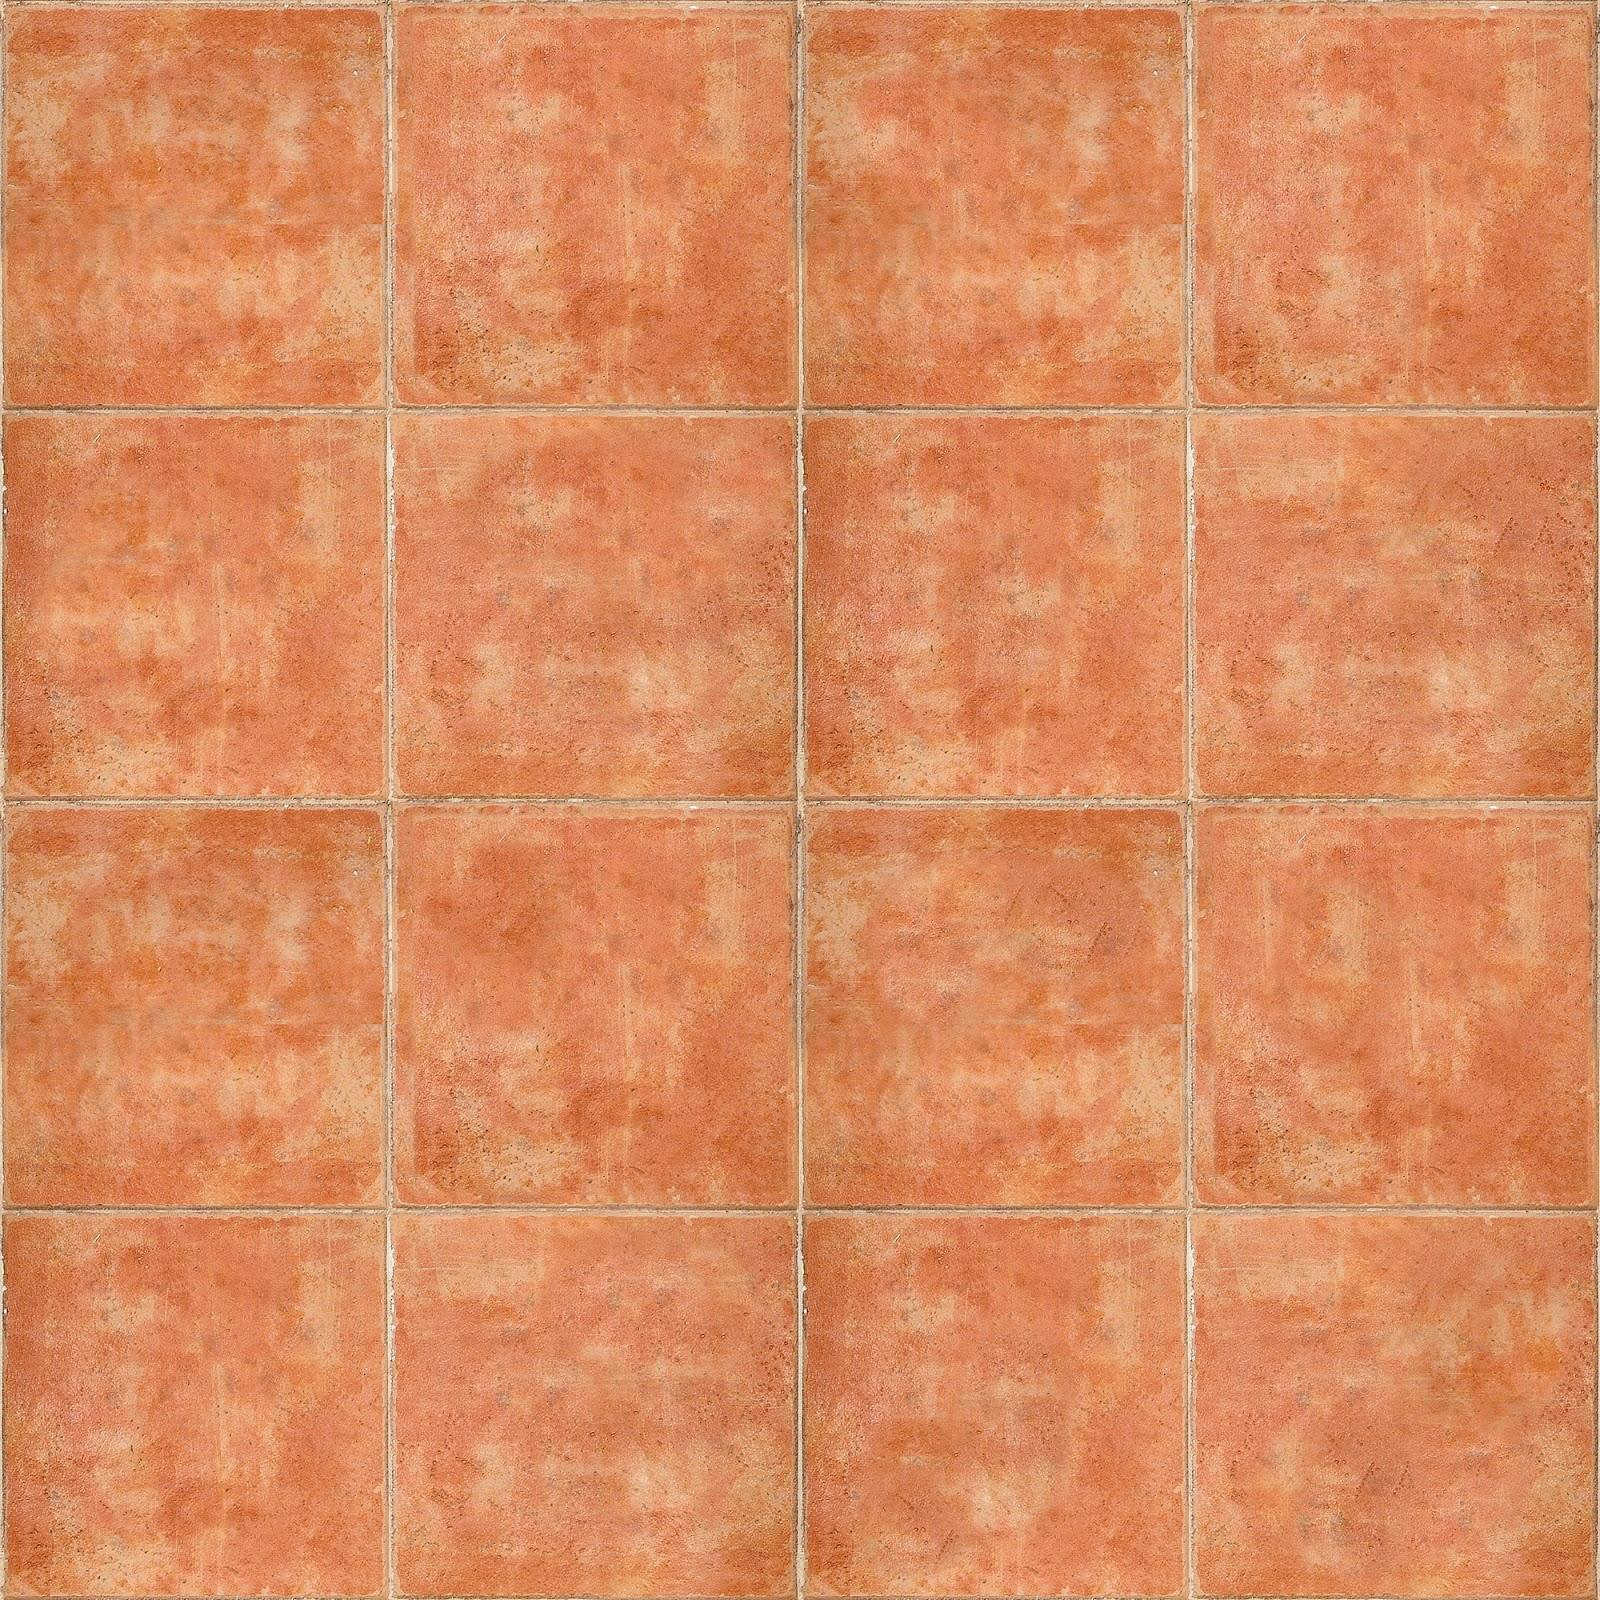 Seamless Terracotta Floor Texture Maps Texturise